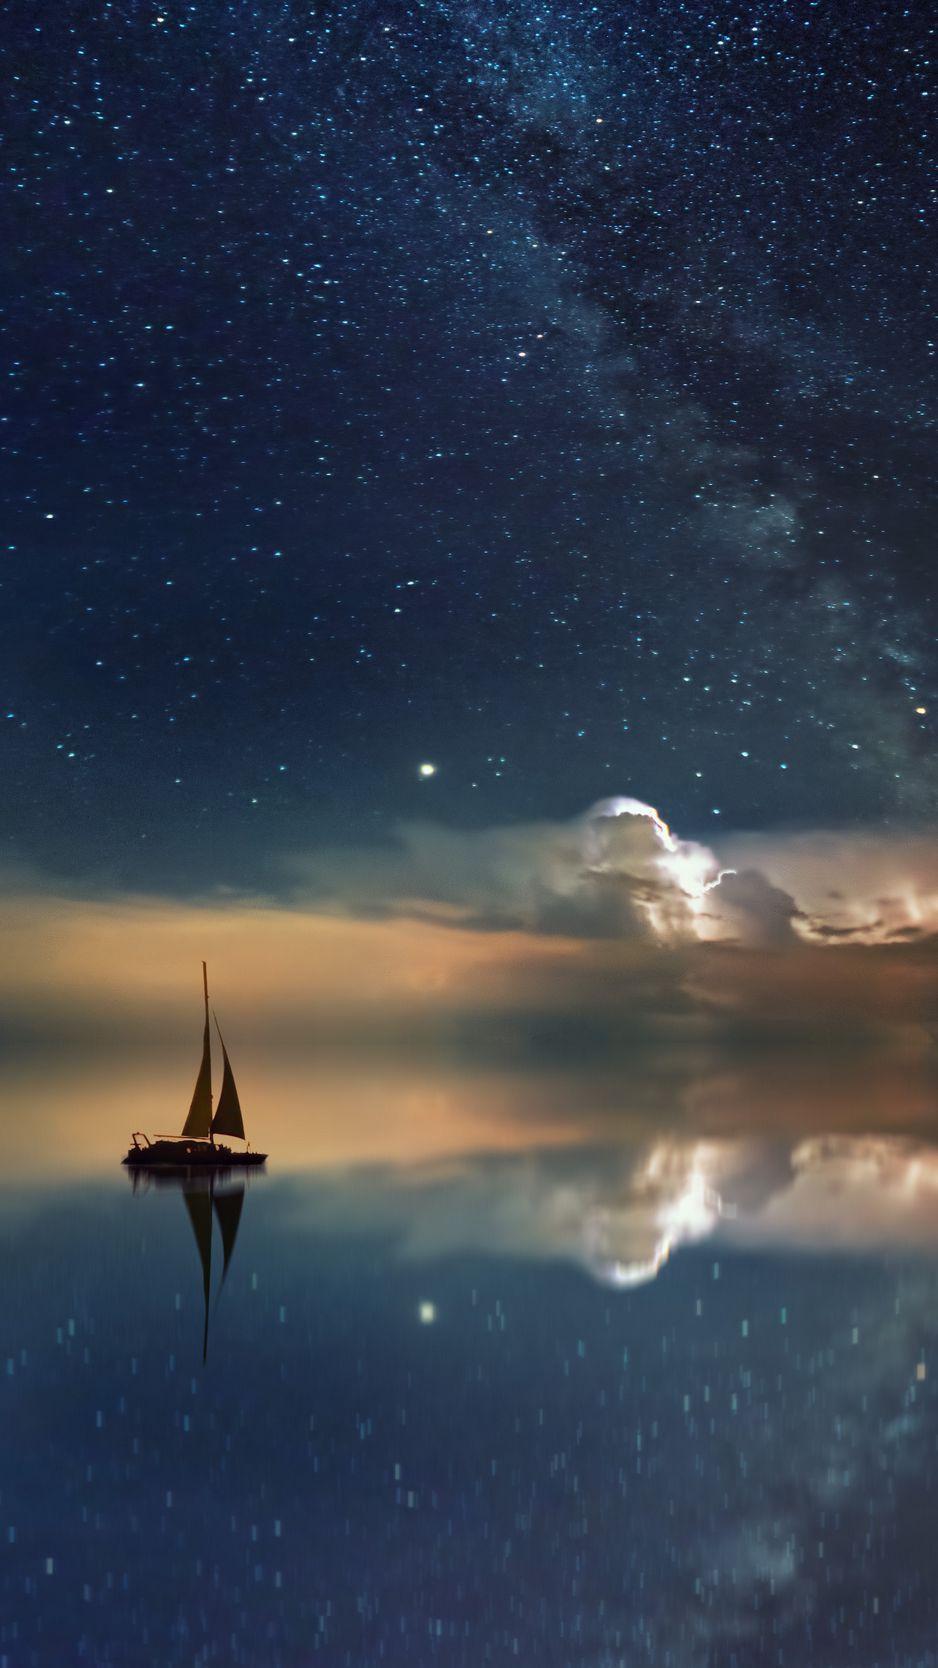 Starry Sky Boat Reflection Sail Night Wallpaper In 2020 Nature Wallpaper Infinity Wallpaper Starry Sky